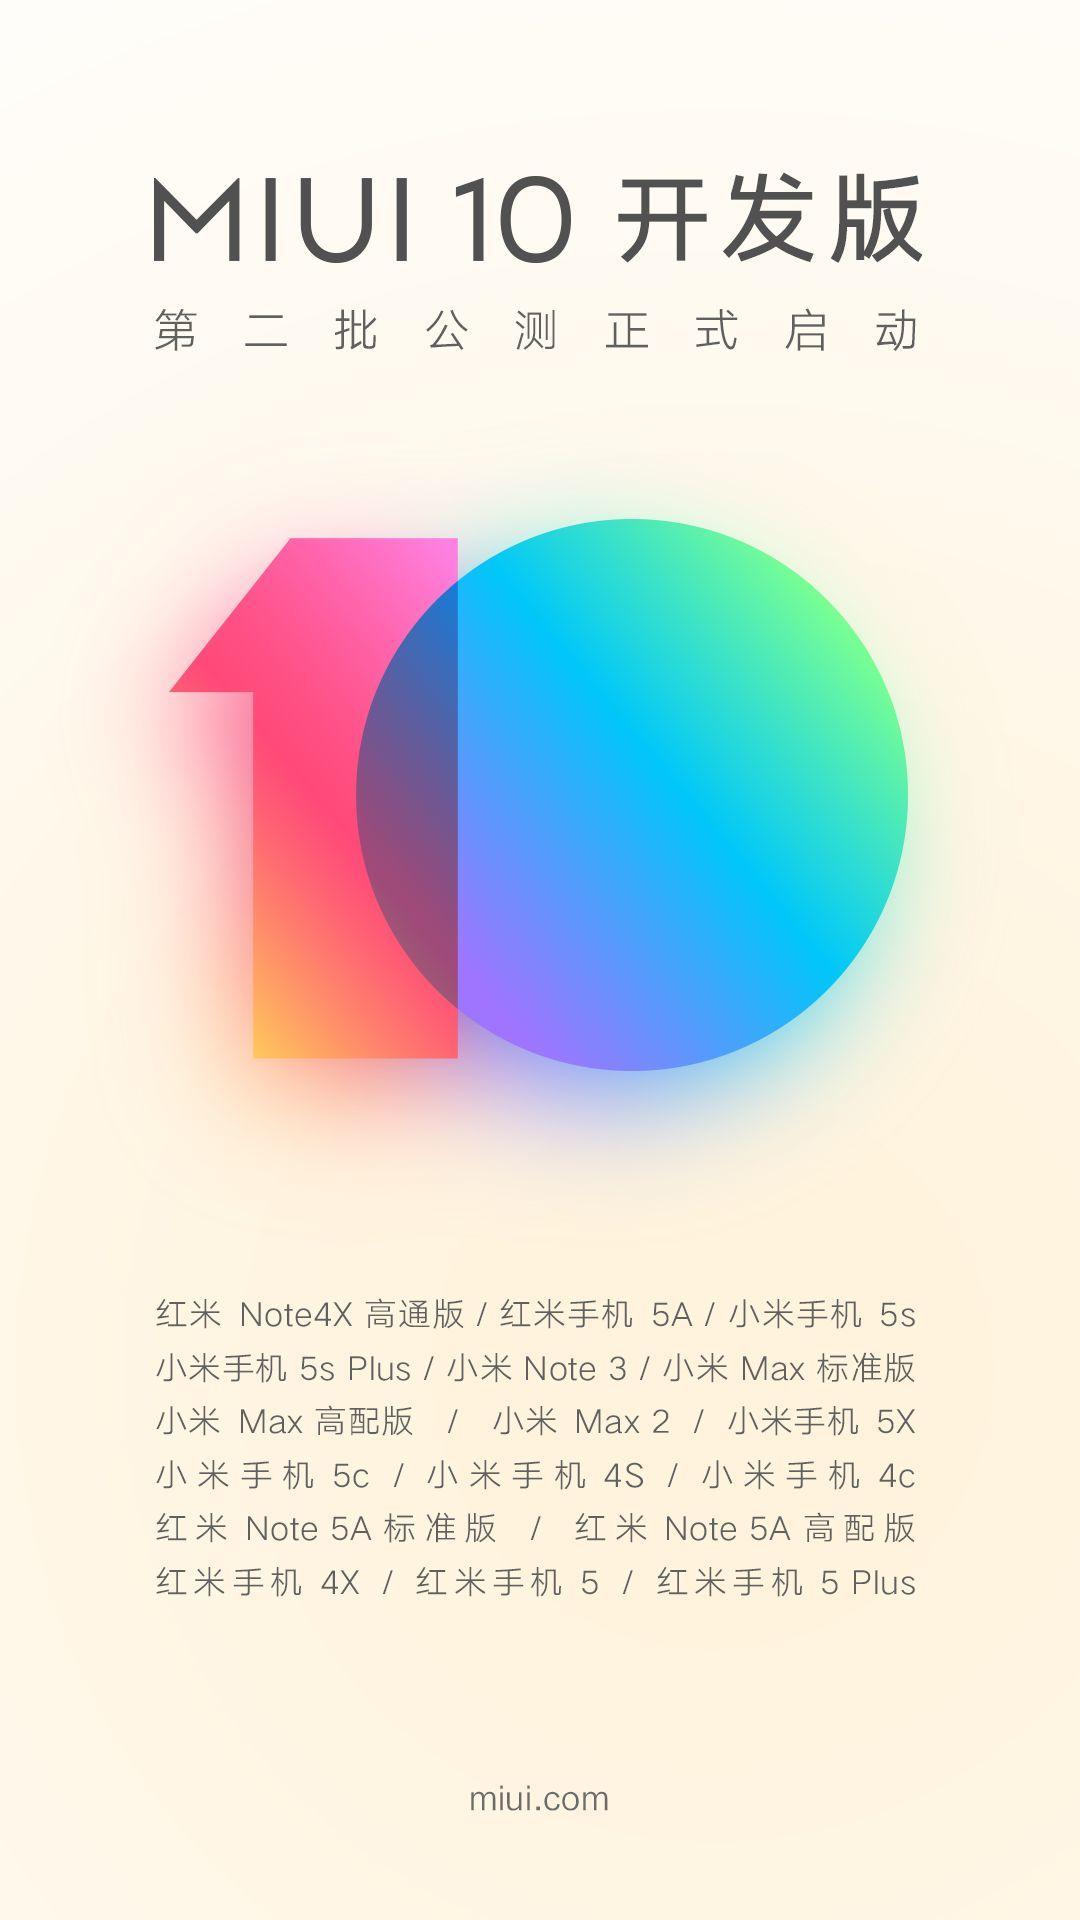 MIUI10,MIUI10下载,MIUI10官方下载